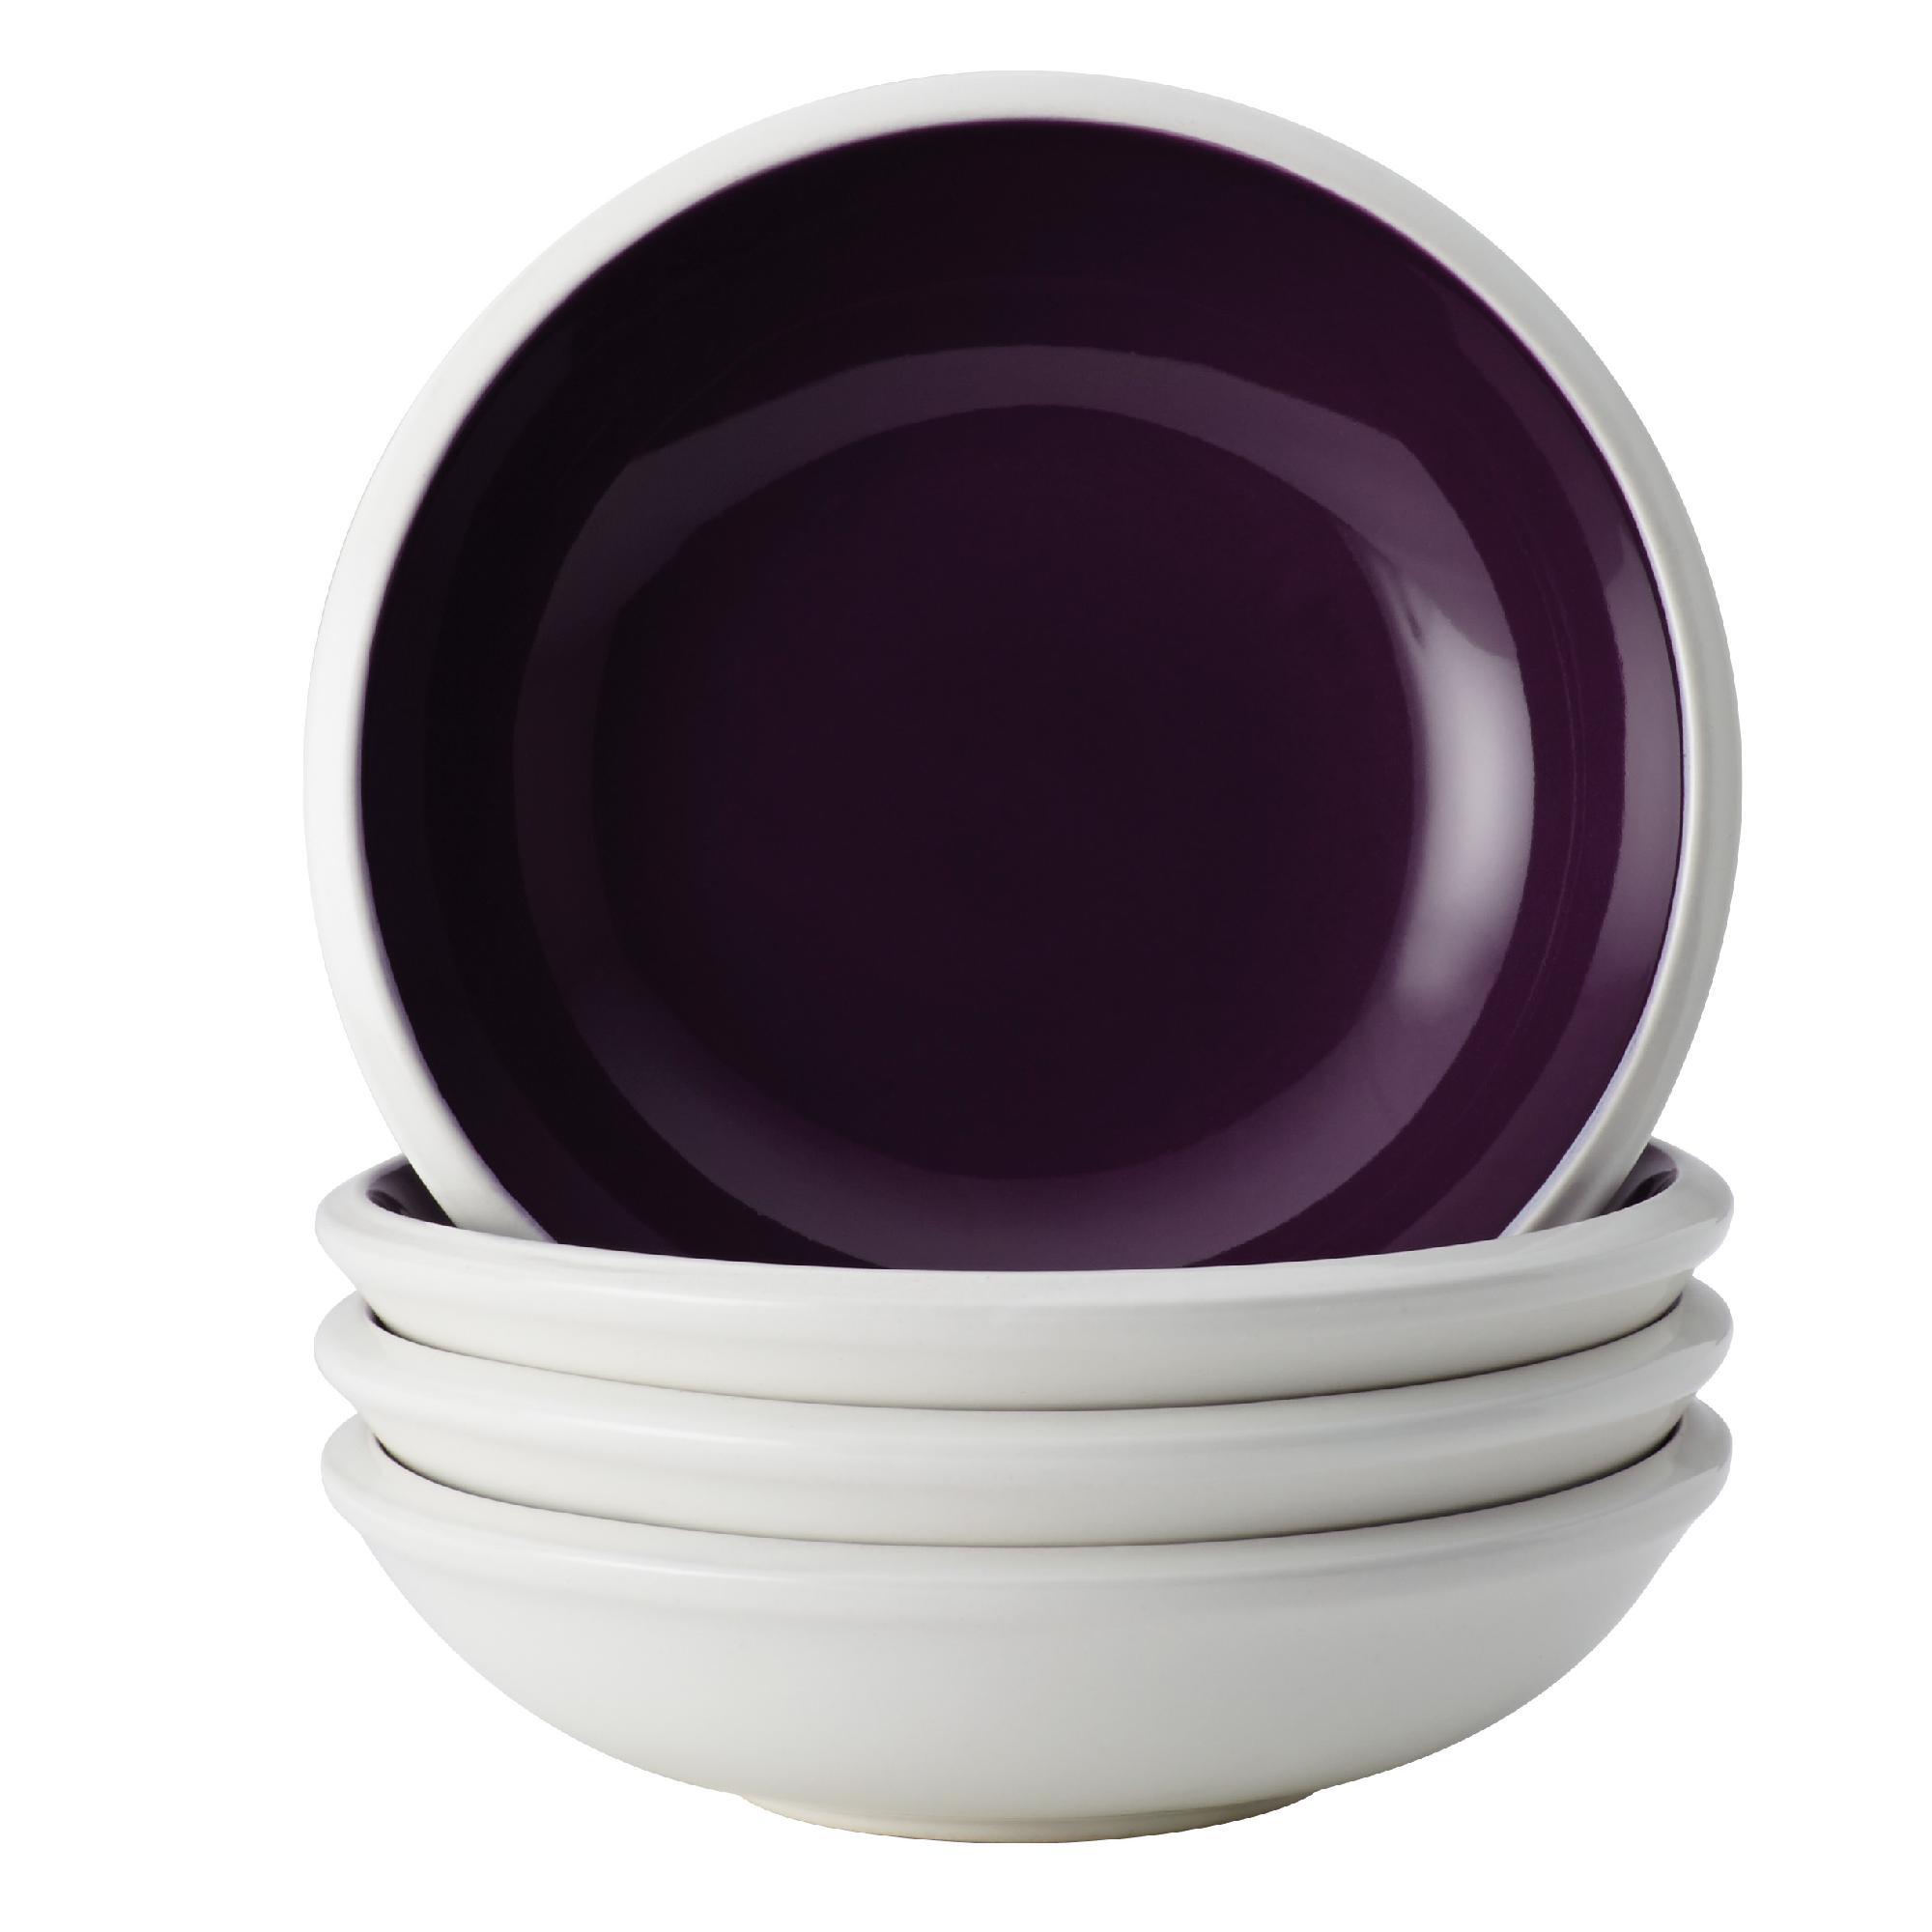 Dinnerware Rise 4-Piece Stoneware Fruit Bowl Set, Purple